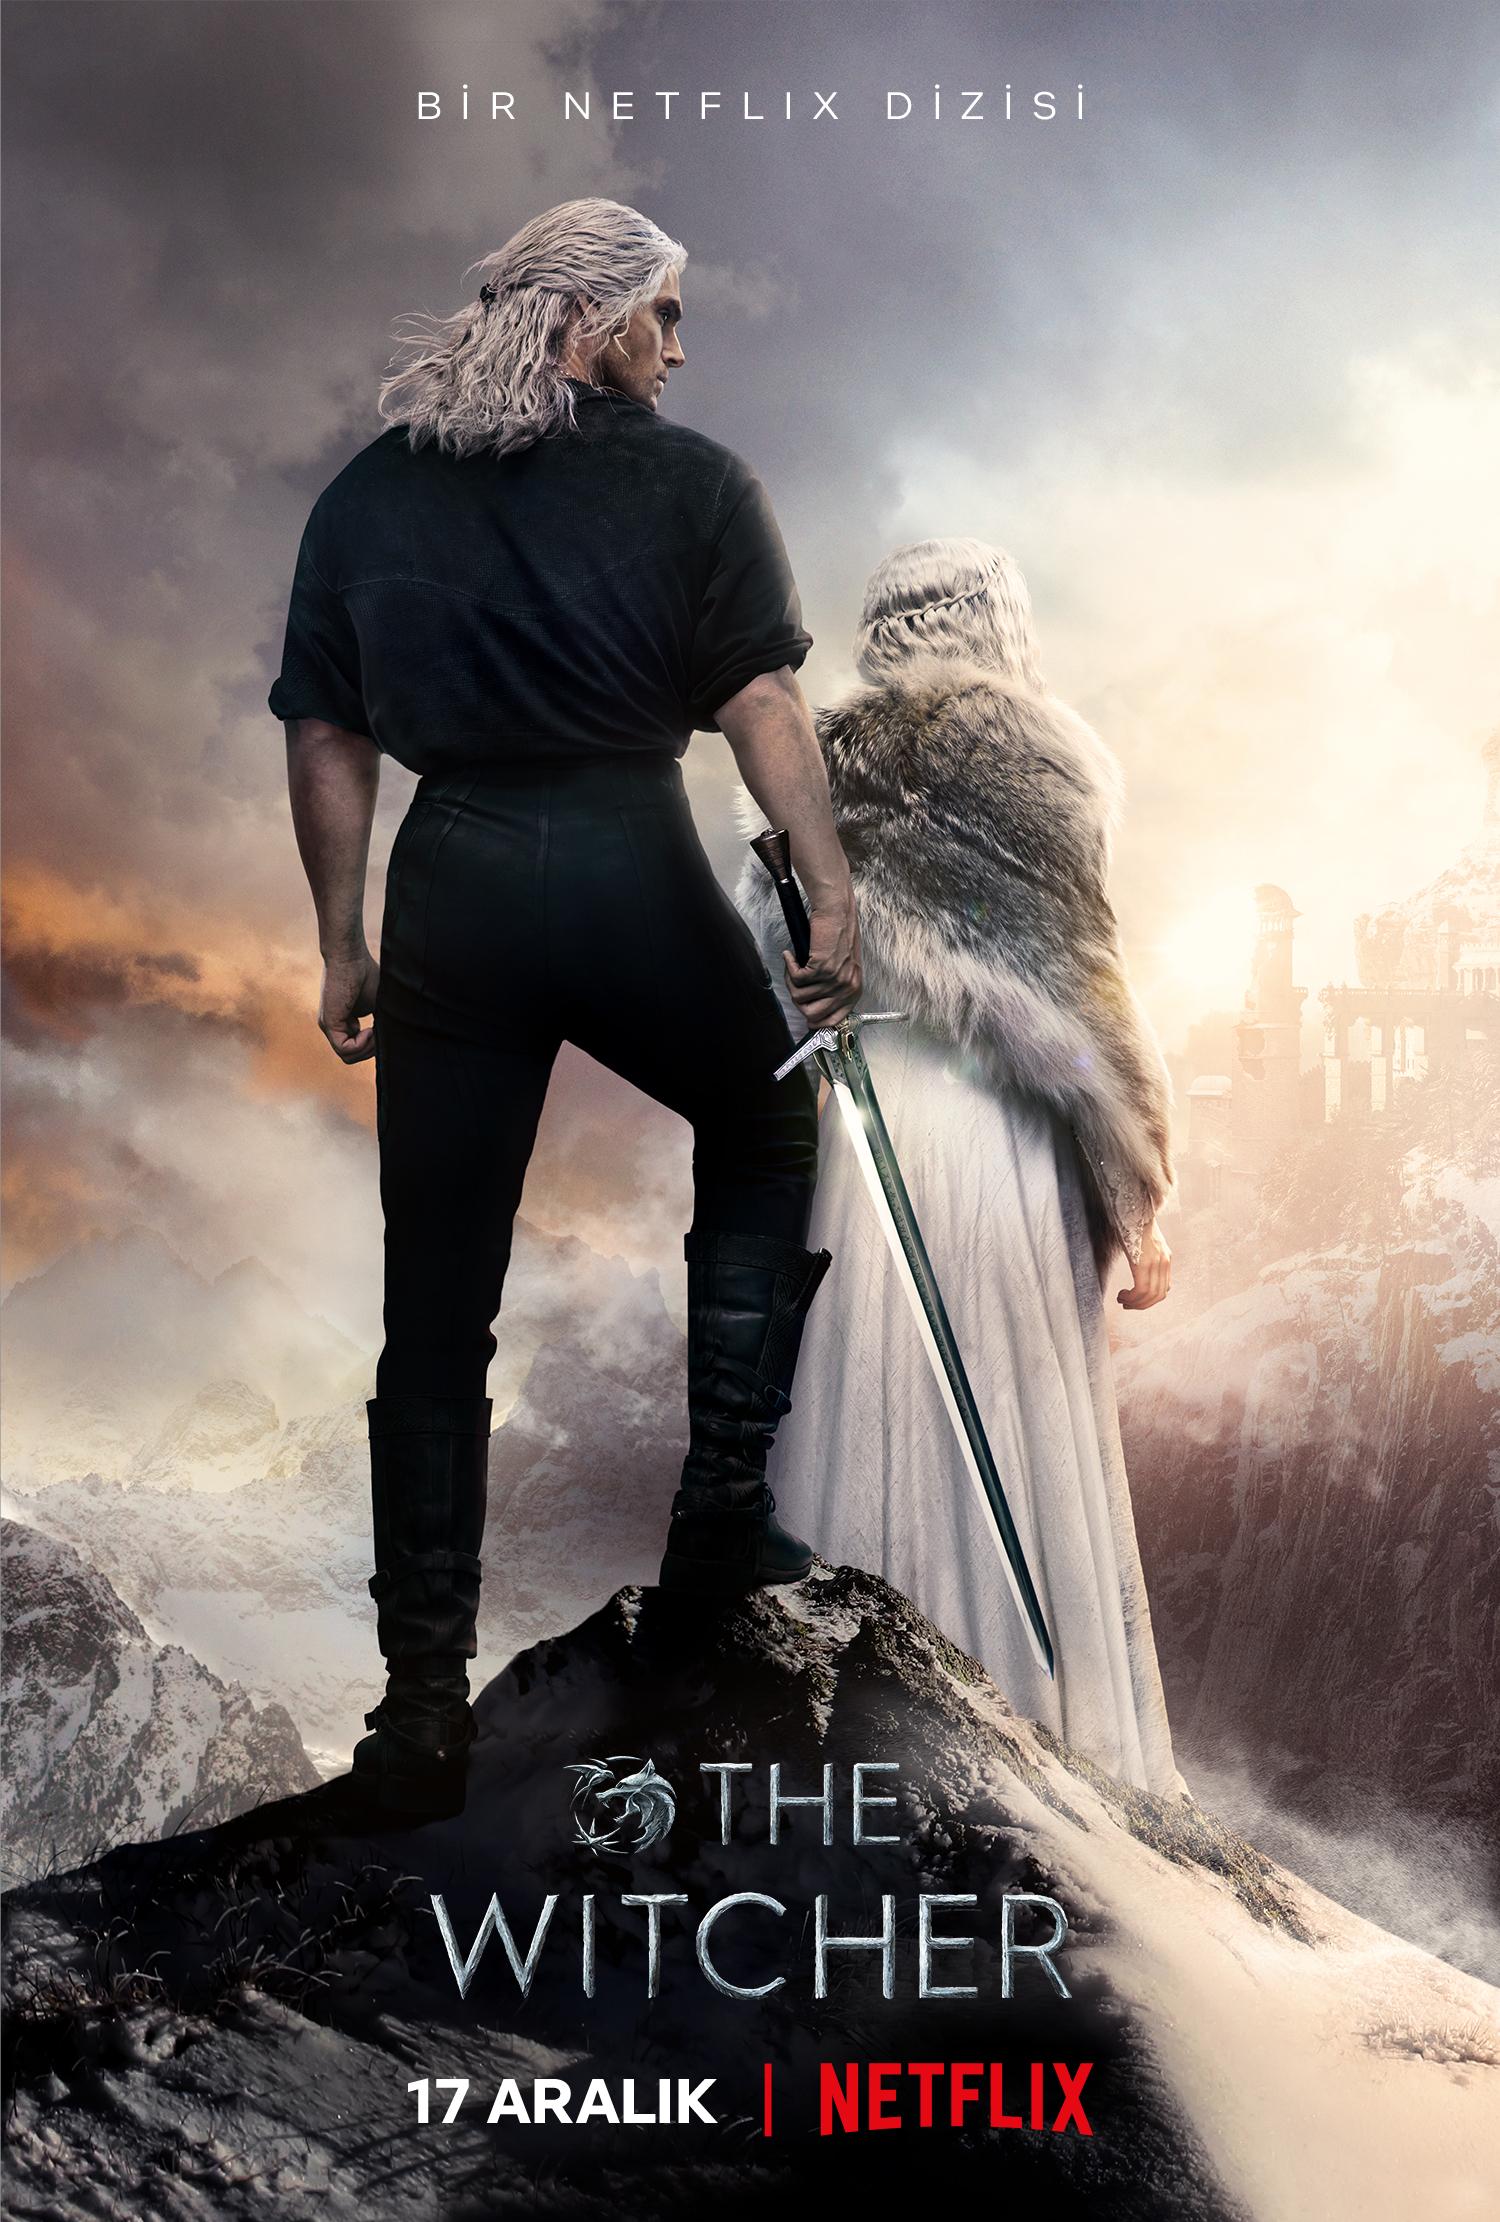 The Witcher Tarih duyurusu afişini